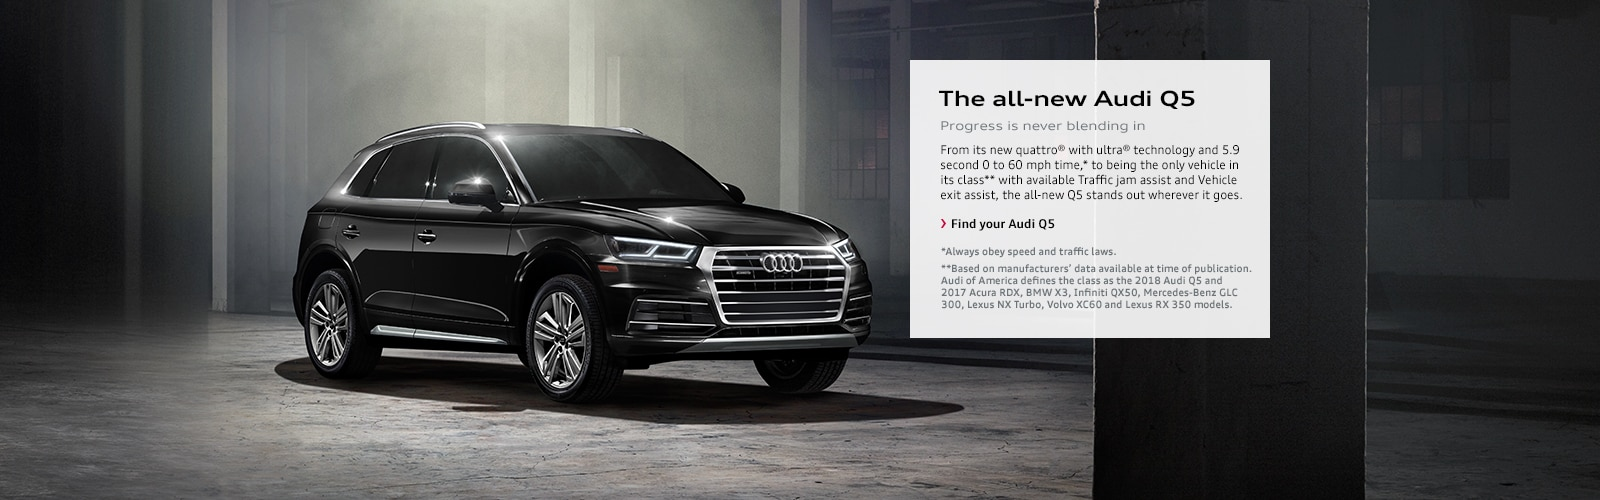 Audi Of Huntington Audi Dealership Huntington NY Near Long Island - Audi dealer long island